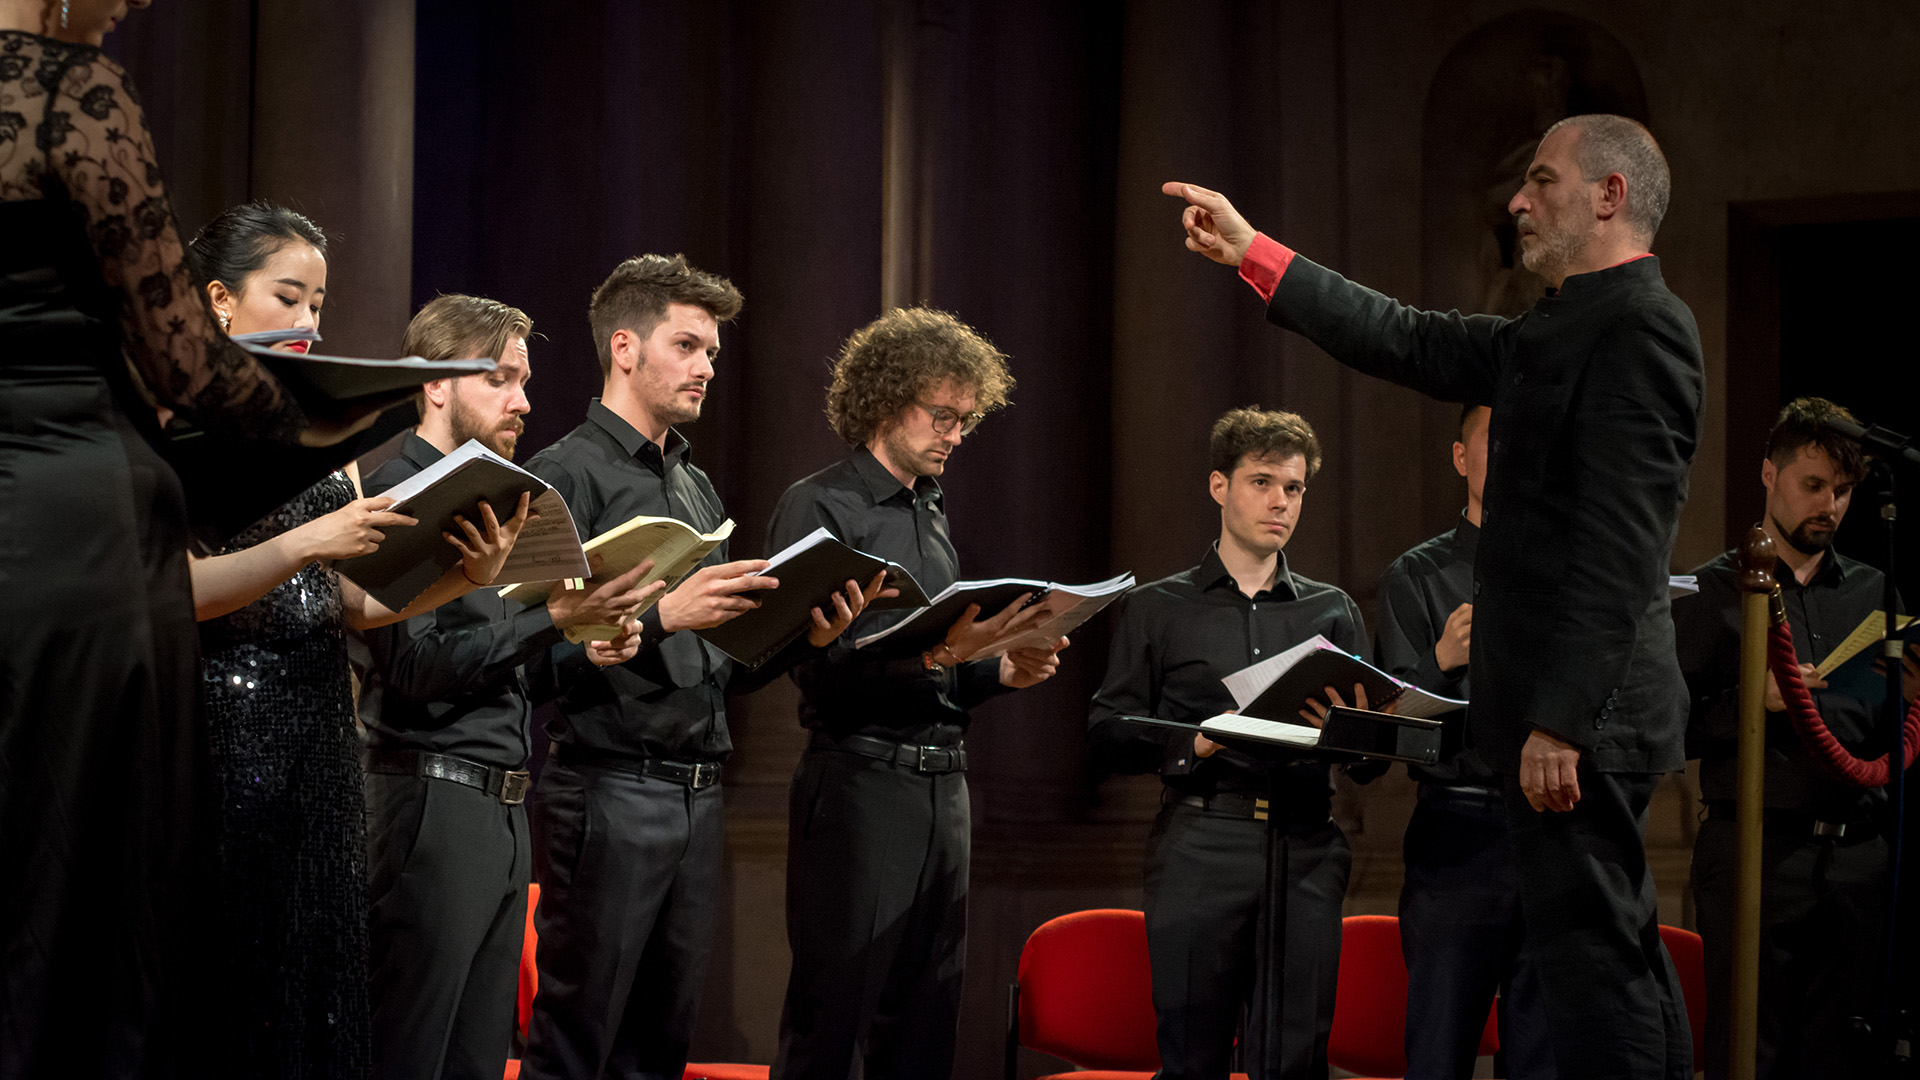 Direttore D'orchestra - Coro / Orchestra Conductor - Choir